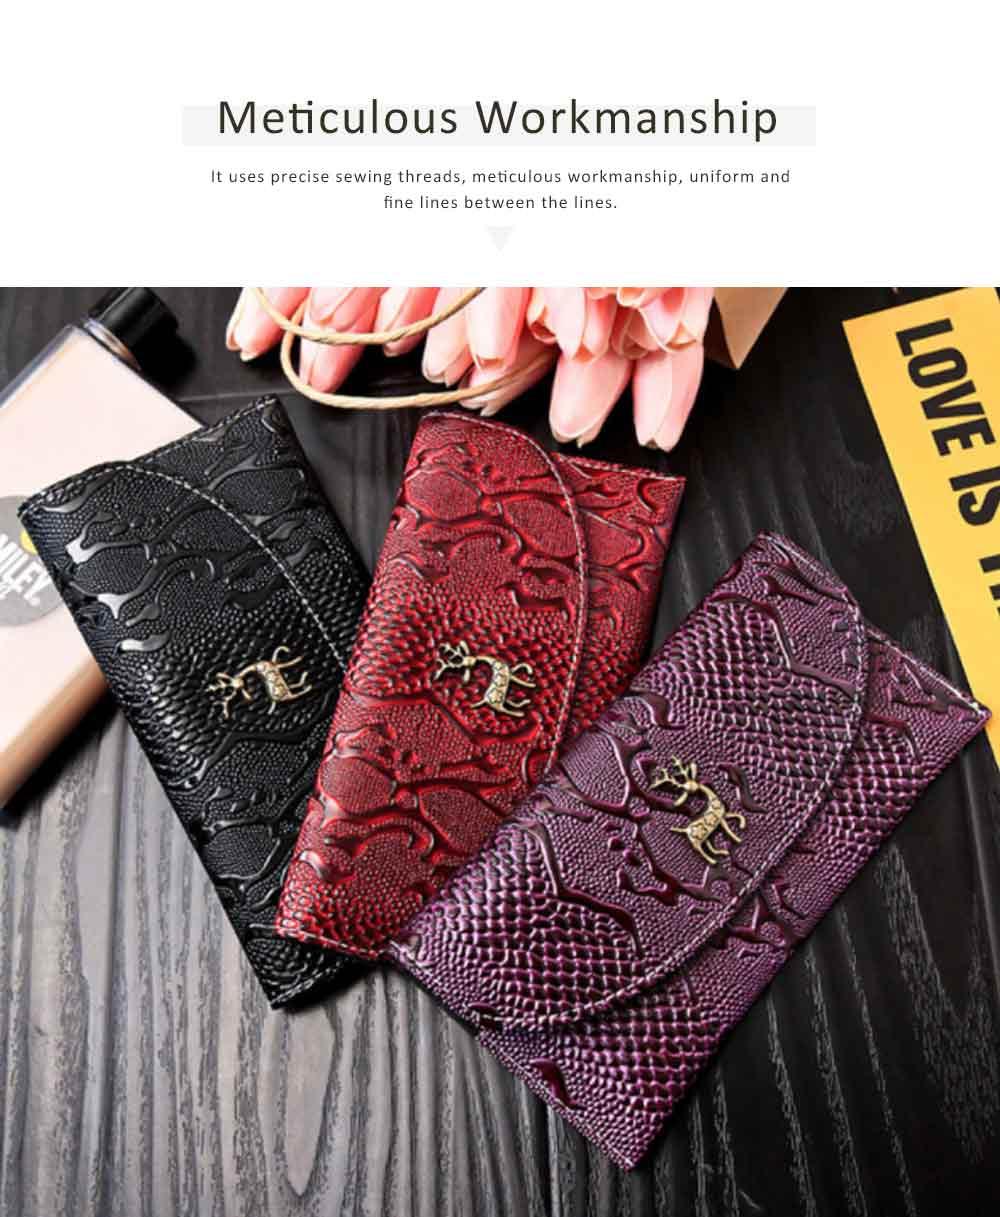 Snake Leather Purse, Sleek Minimalist Buckle Wallet For Ladies 1